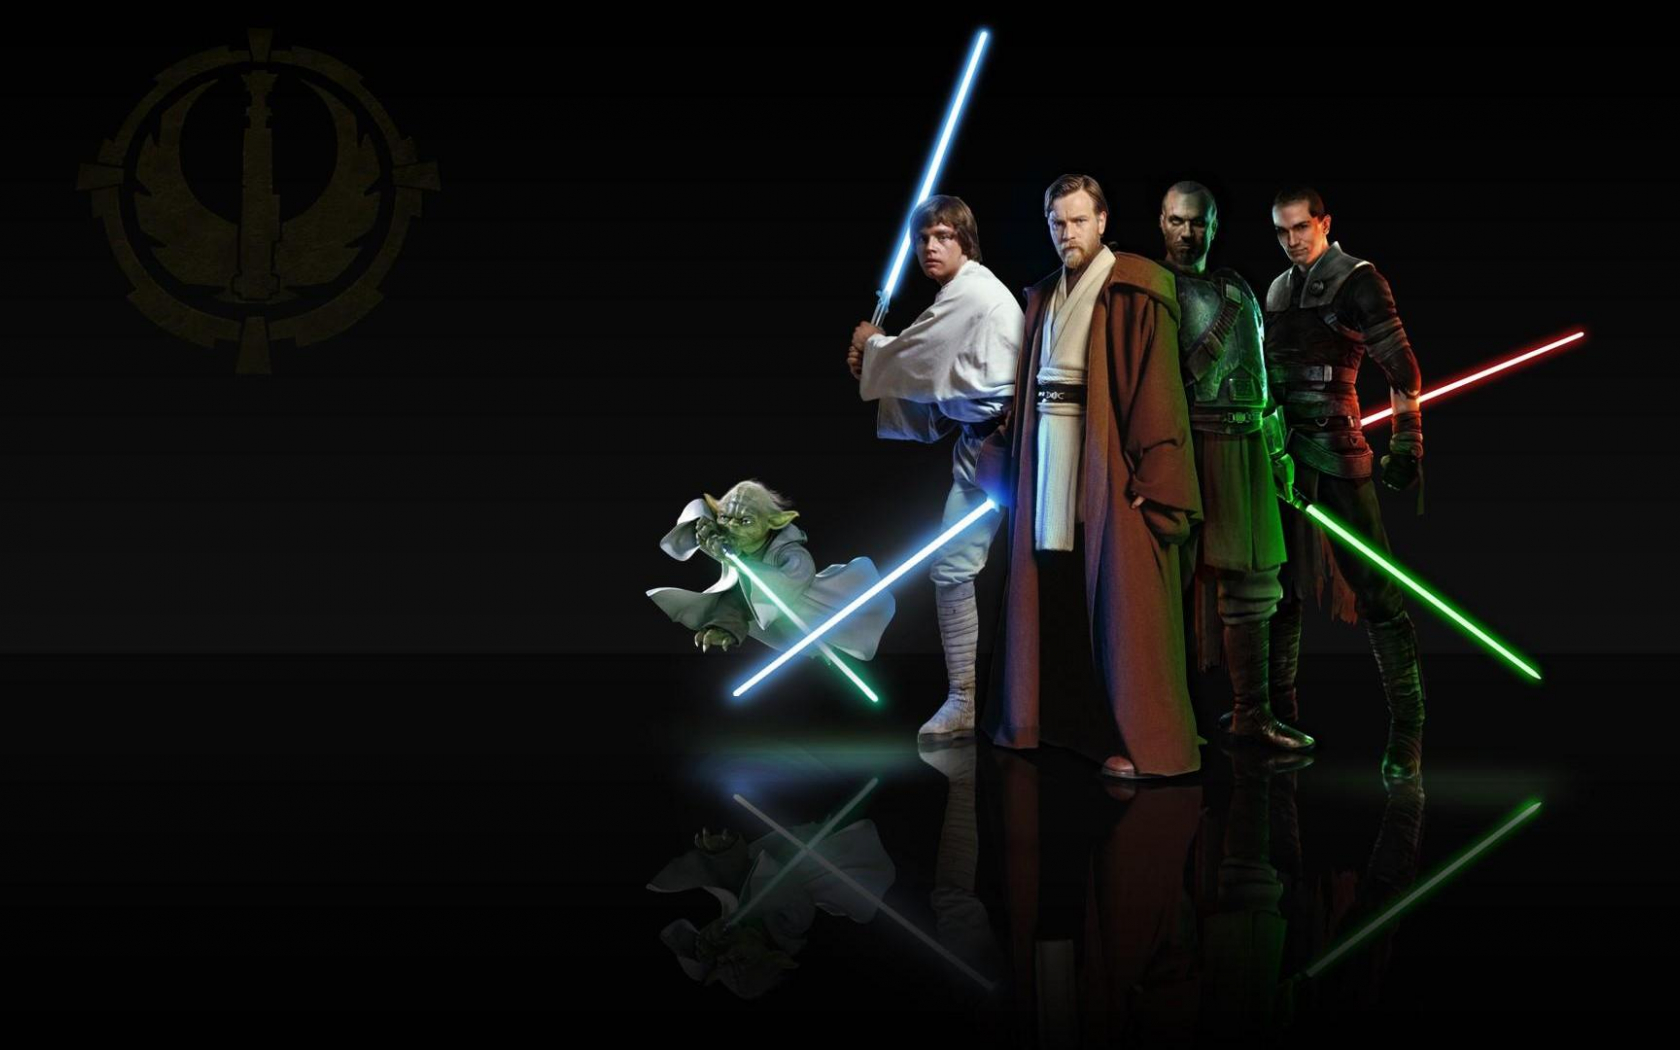 Free Download Star Wars Jedi Obi Wan Kenobi Light Side 1080x1920 Wallpaper Hdtv 1920x1080 For Your Desktop Mobile Tablet Explore 47 Star Wars 1080p Hd Wallpaper Hd Star Wars